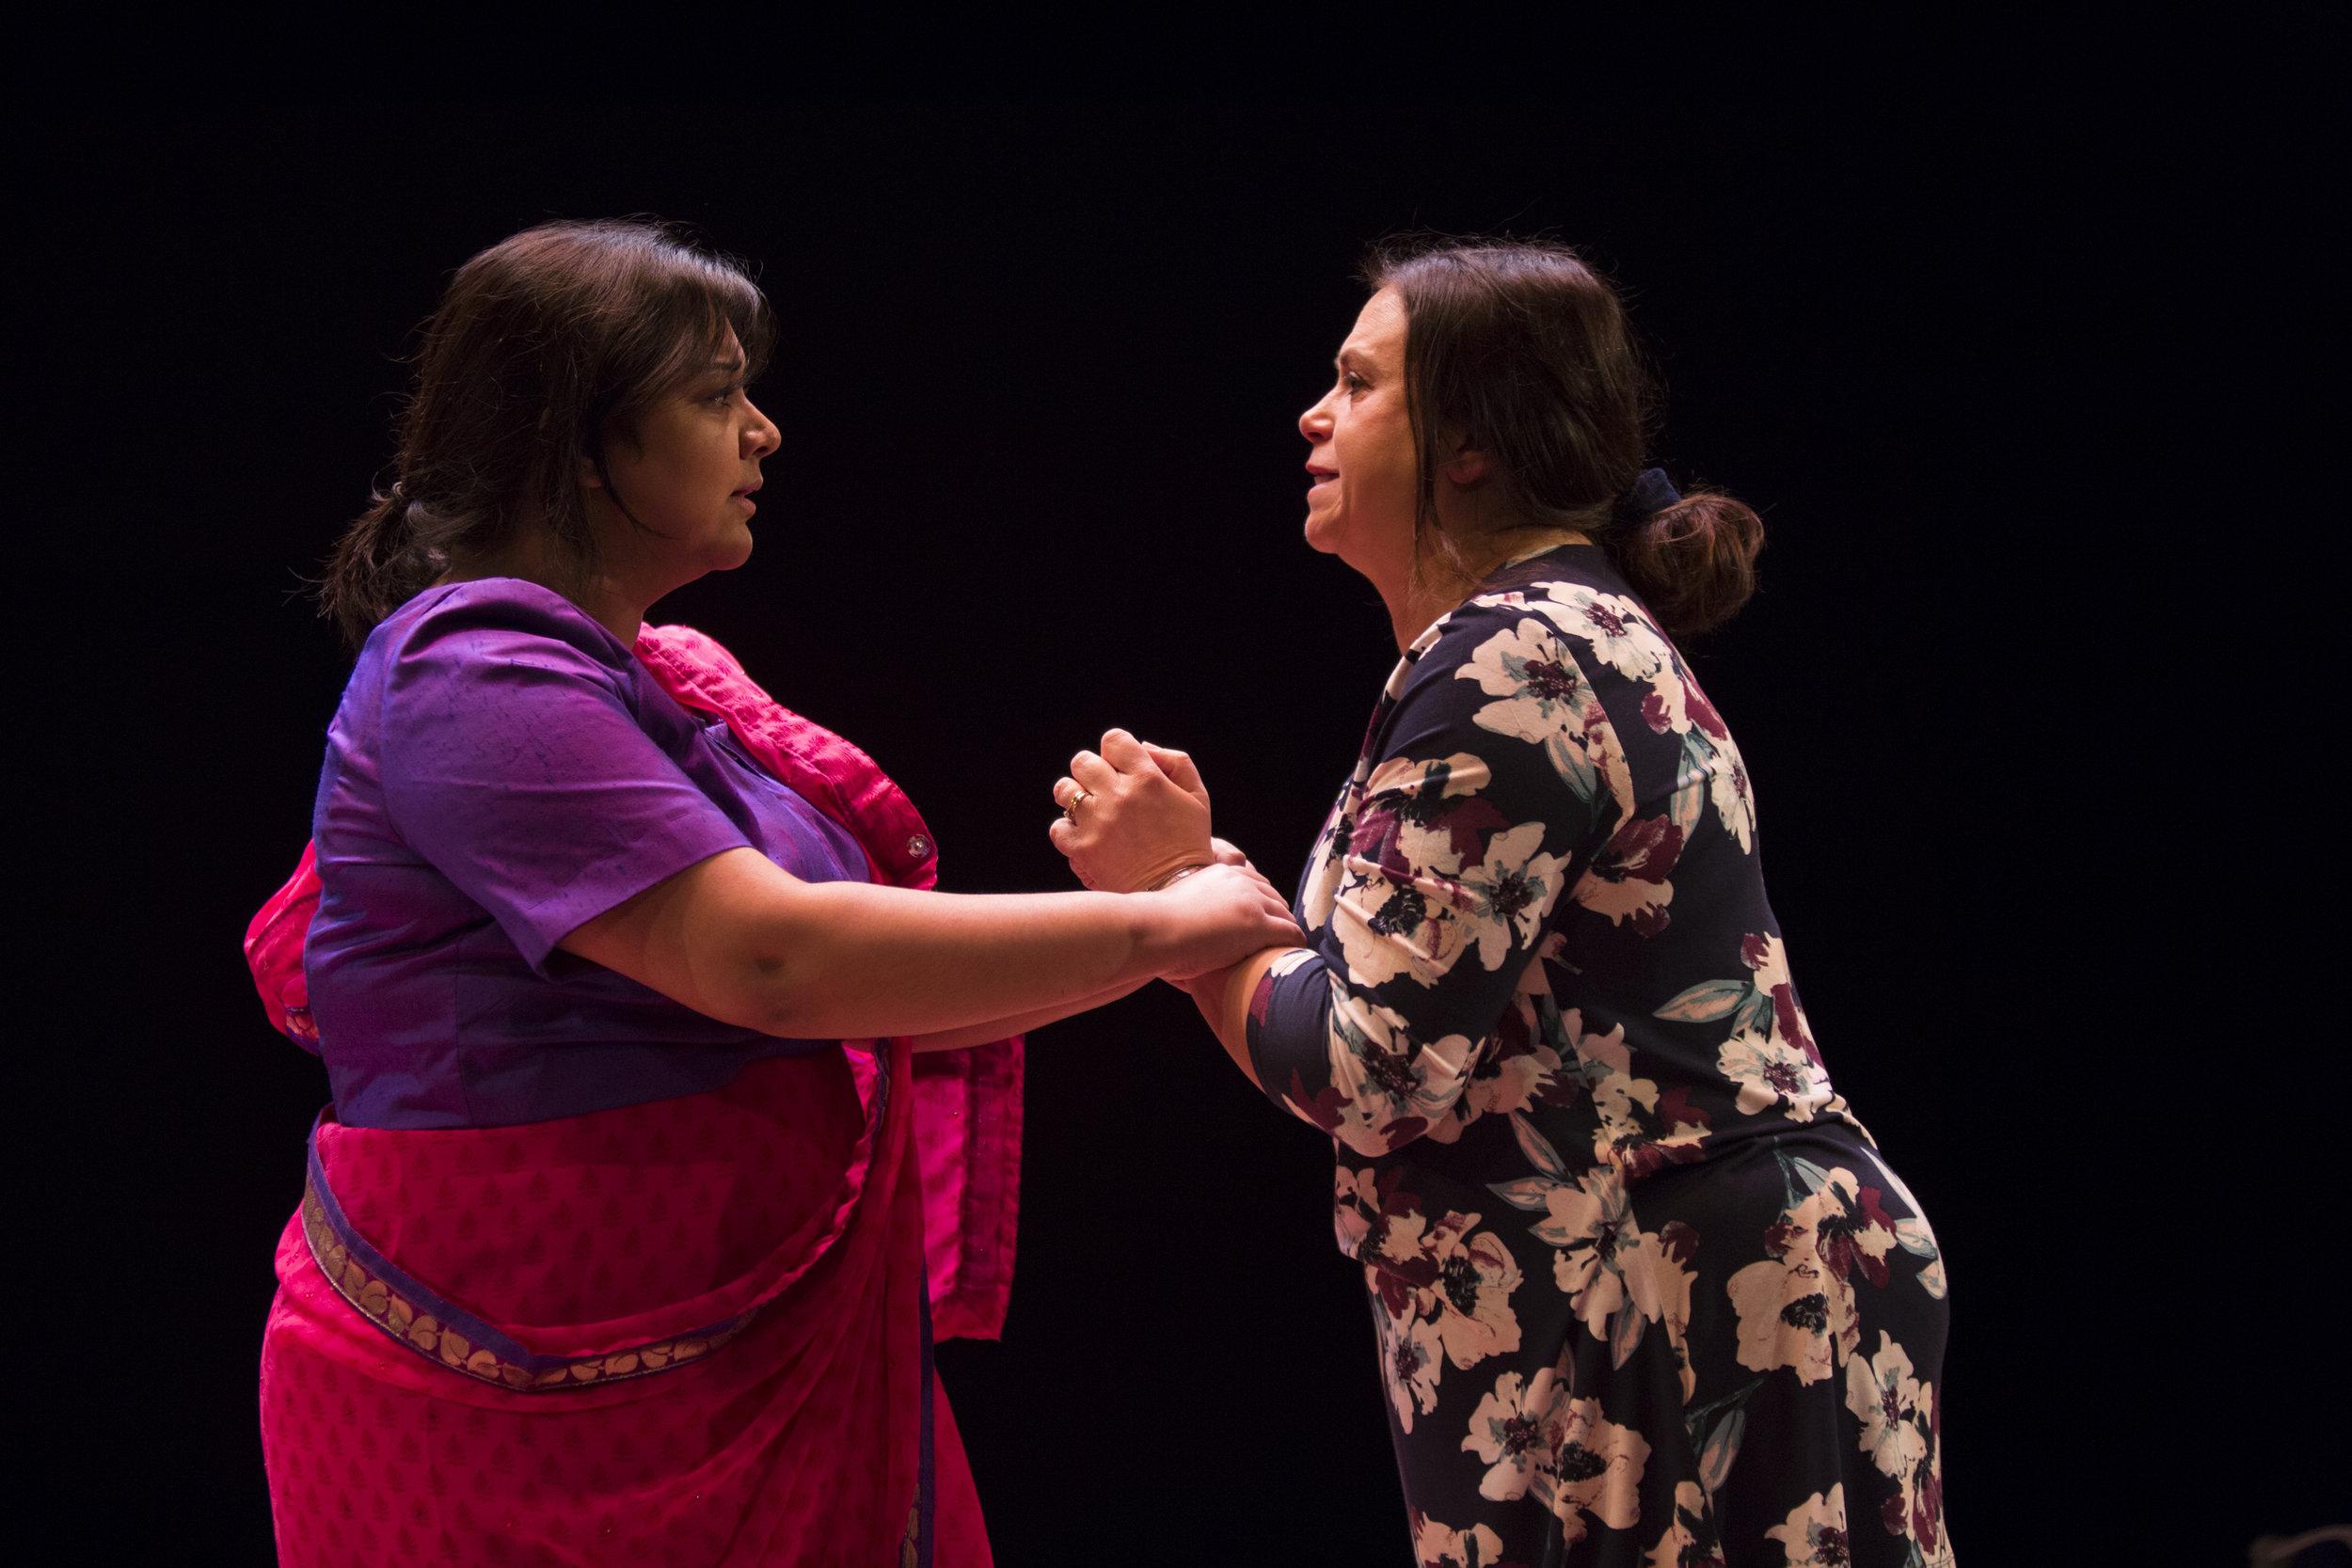 Sukh Ojla as Vira and Yasmin Wilde as Deesh_credit Ellie Kurttz.JPG